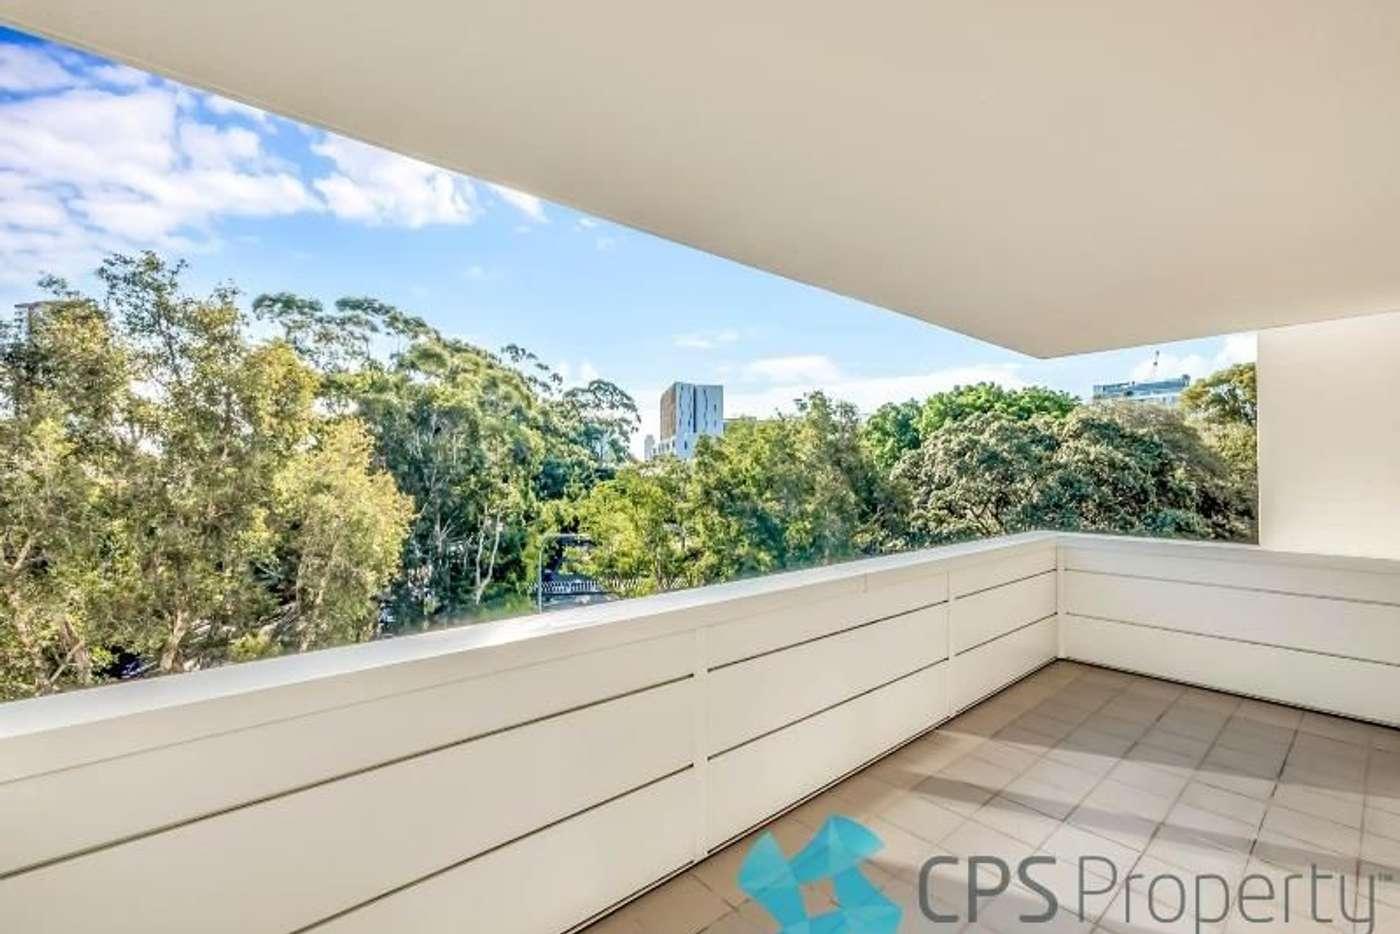 Main view of Homely apartment listing, 31/106 Joynton Avenue, Zetland NSW 2017